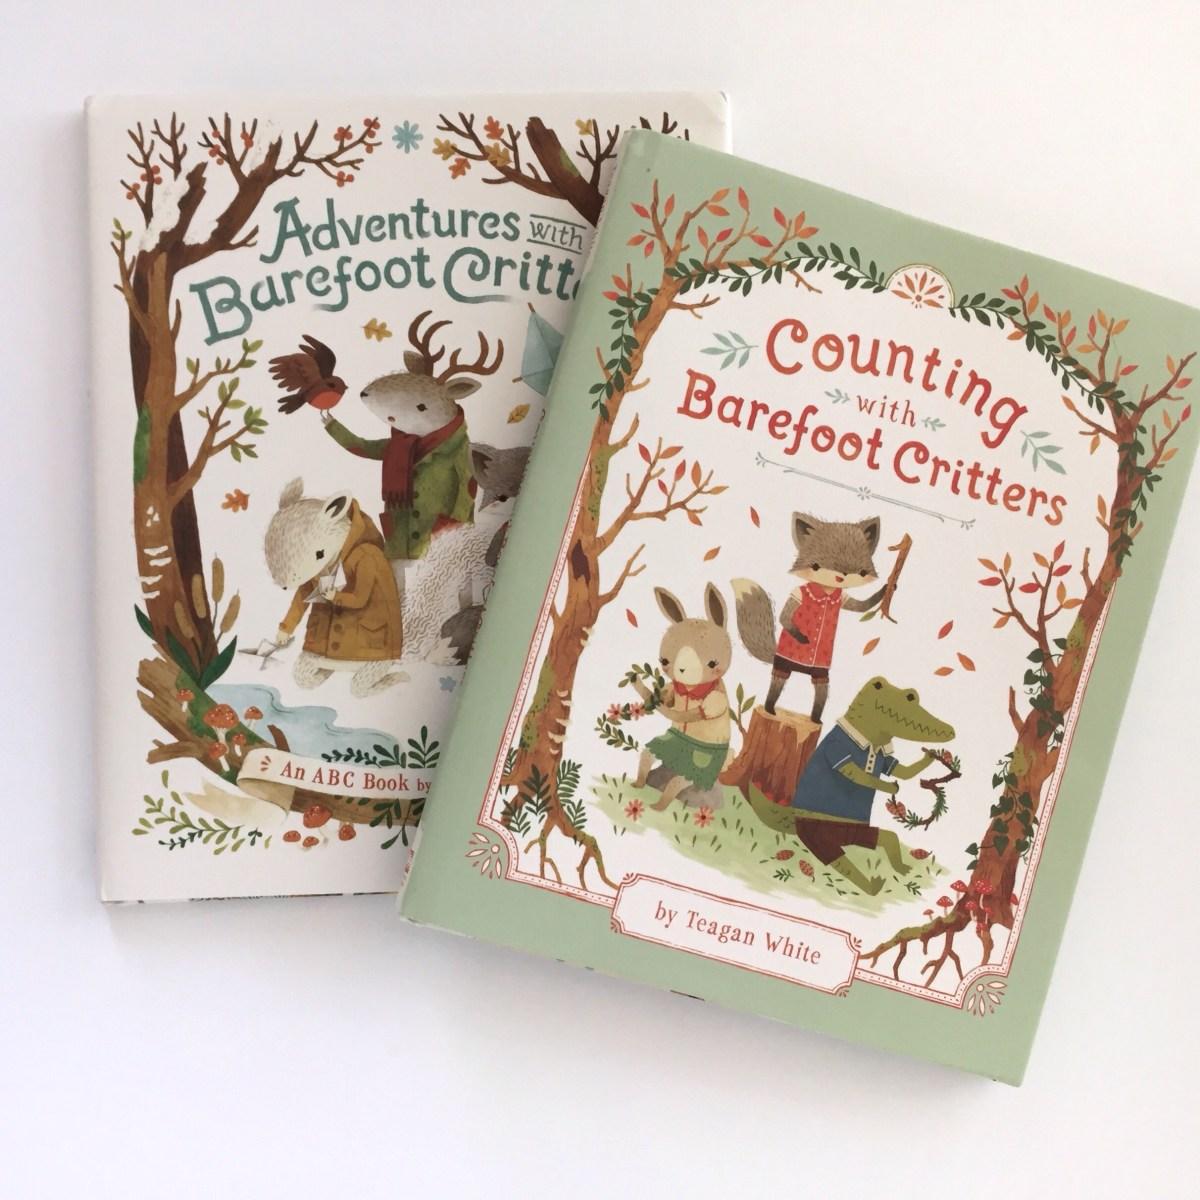 8 amazing ABC books + giveaway